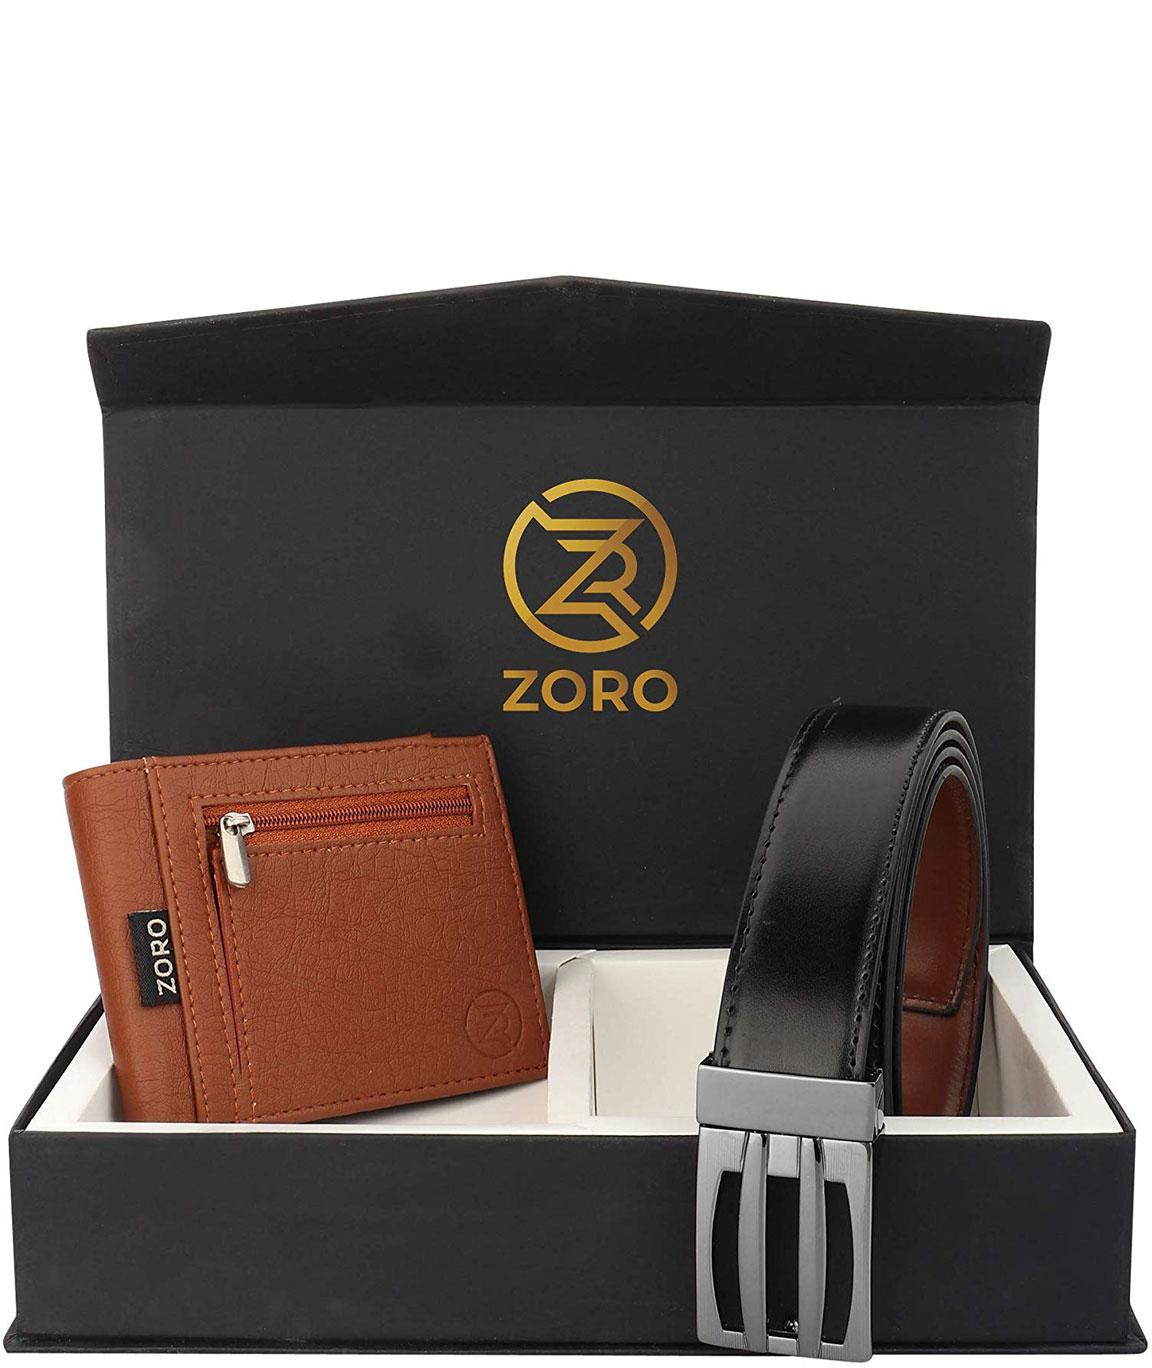 ZORO Reversible PU belt and wallet combo, formal black and brown reversible belt, gift for mens, gents belt, mens wallet ZR-TX01-109T